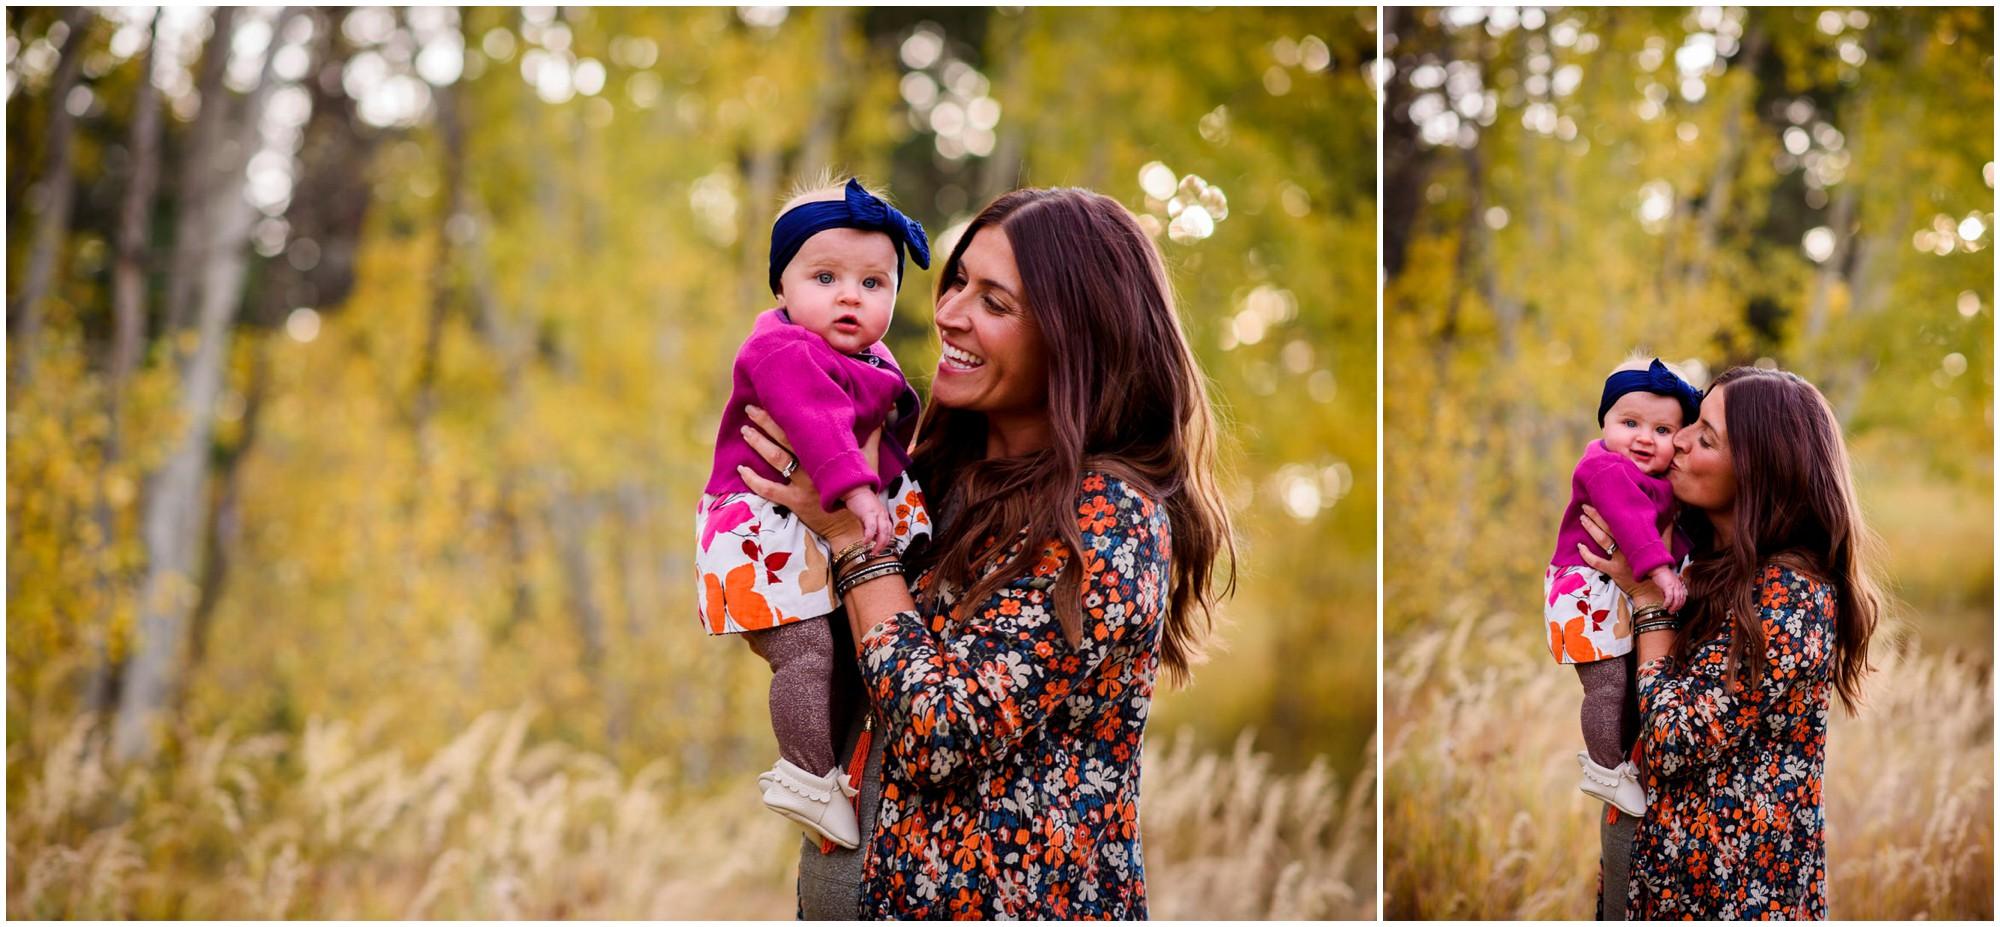 21-meyer-ranch-fall-family-photography-evans.jpg